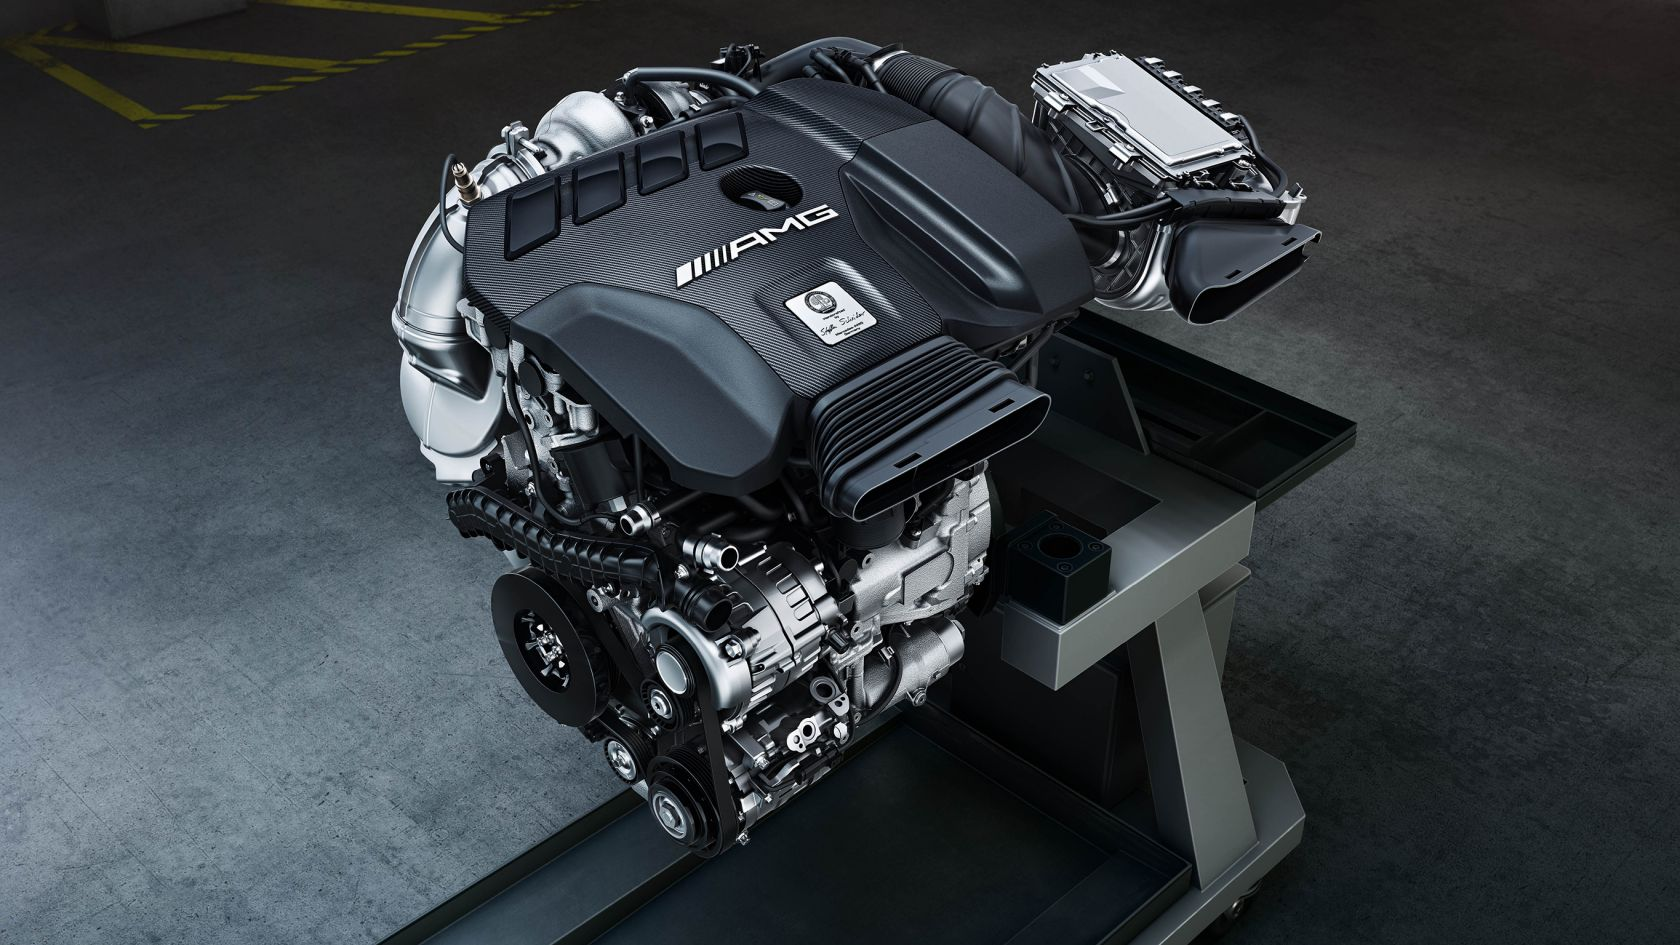 4-циліндровий турбодвигун 2 л